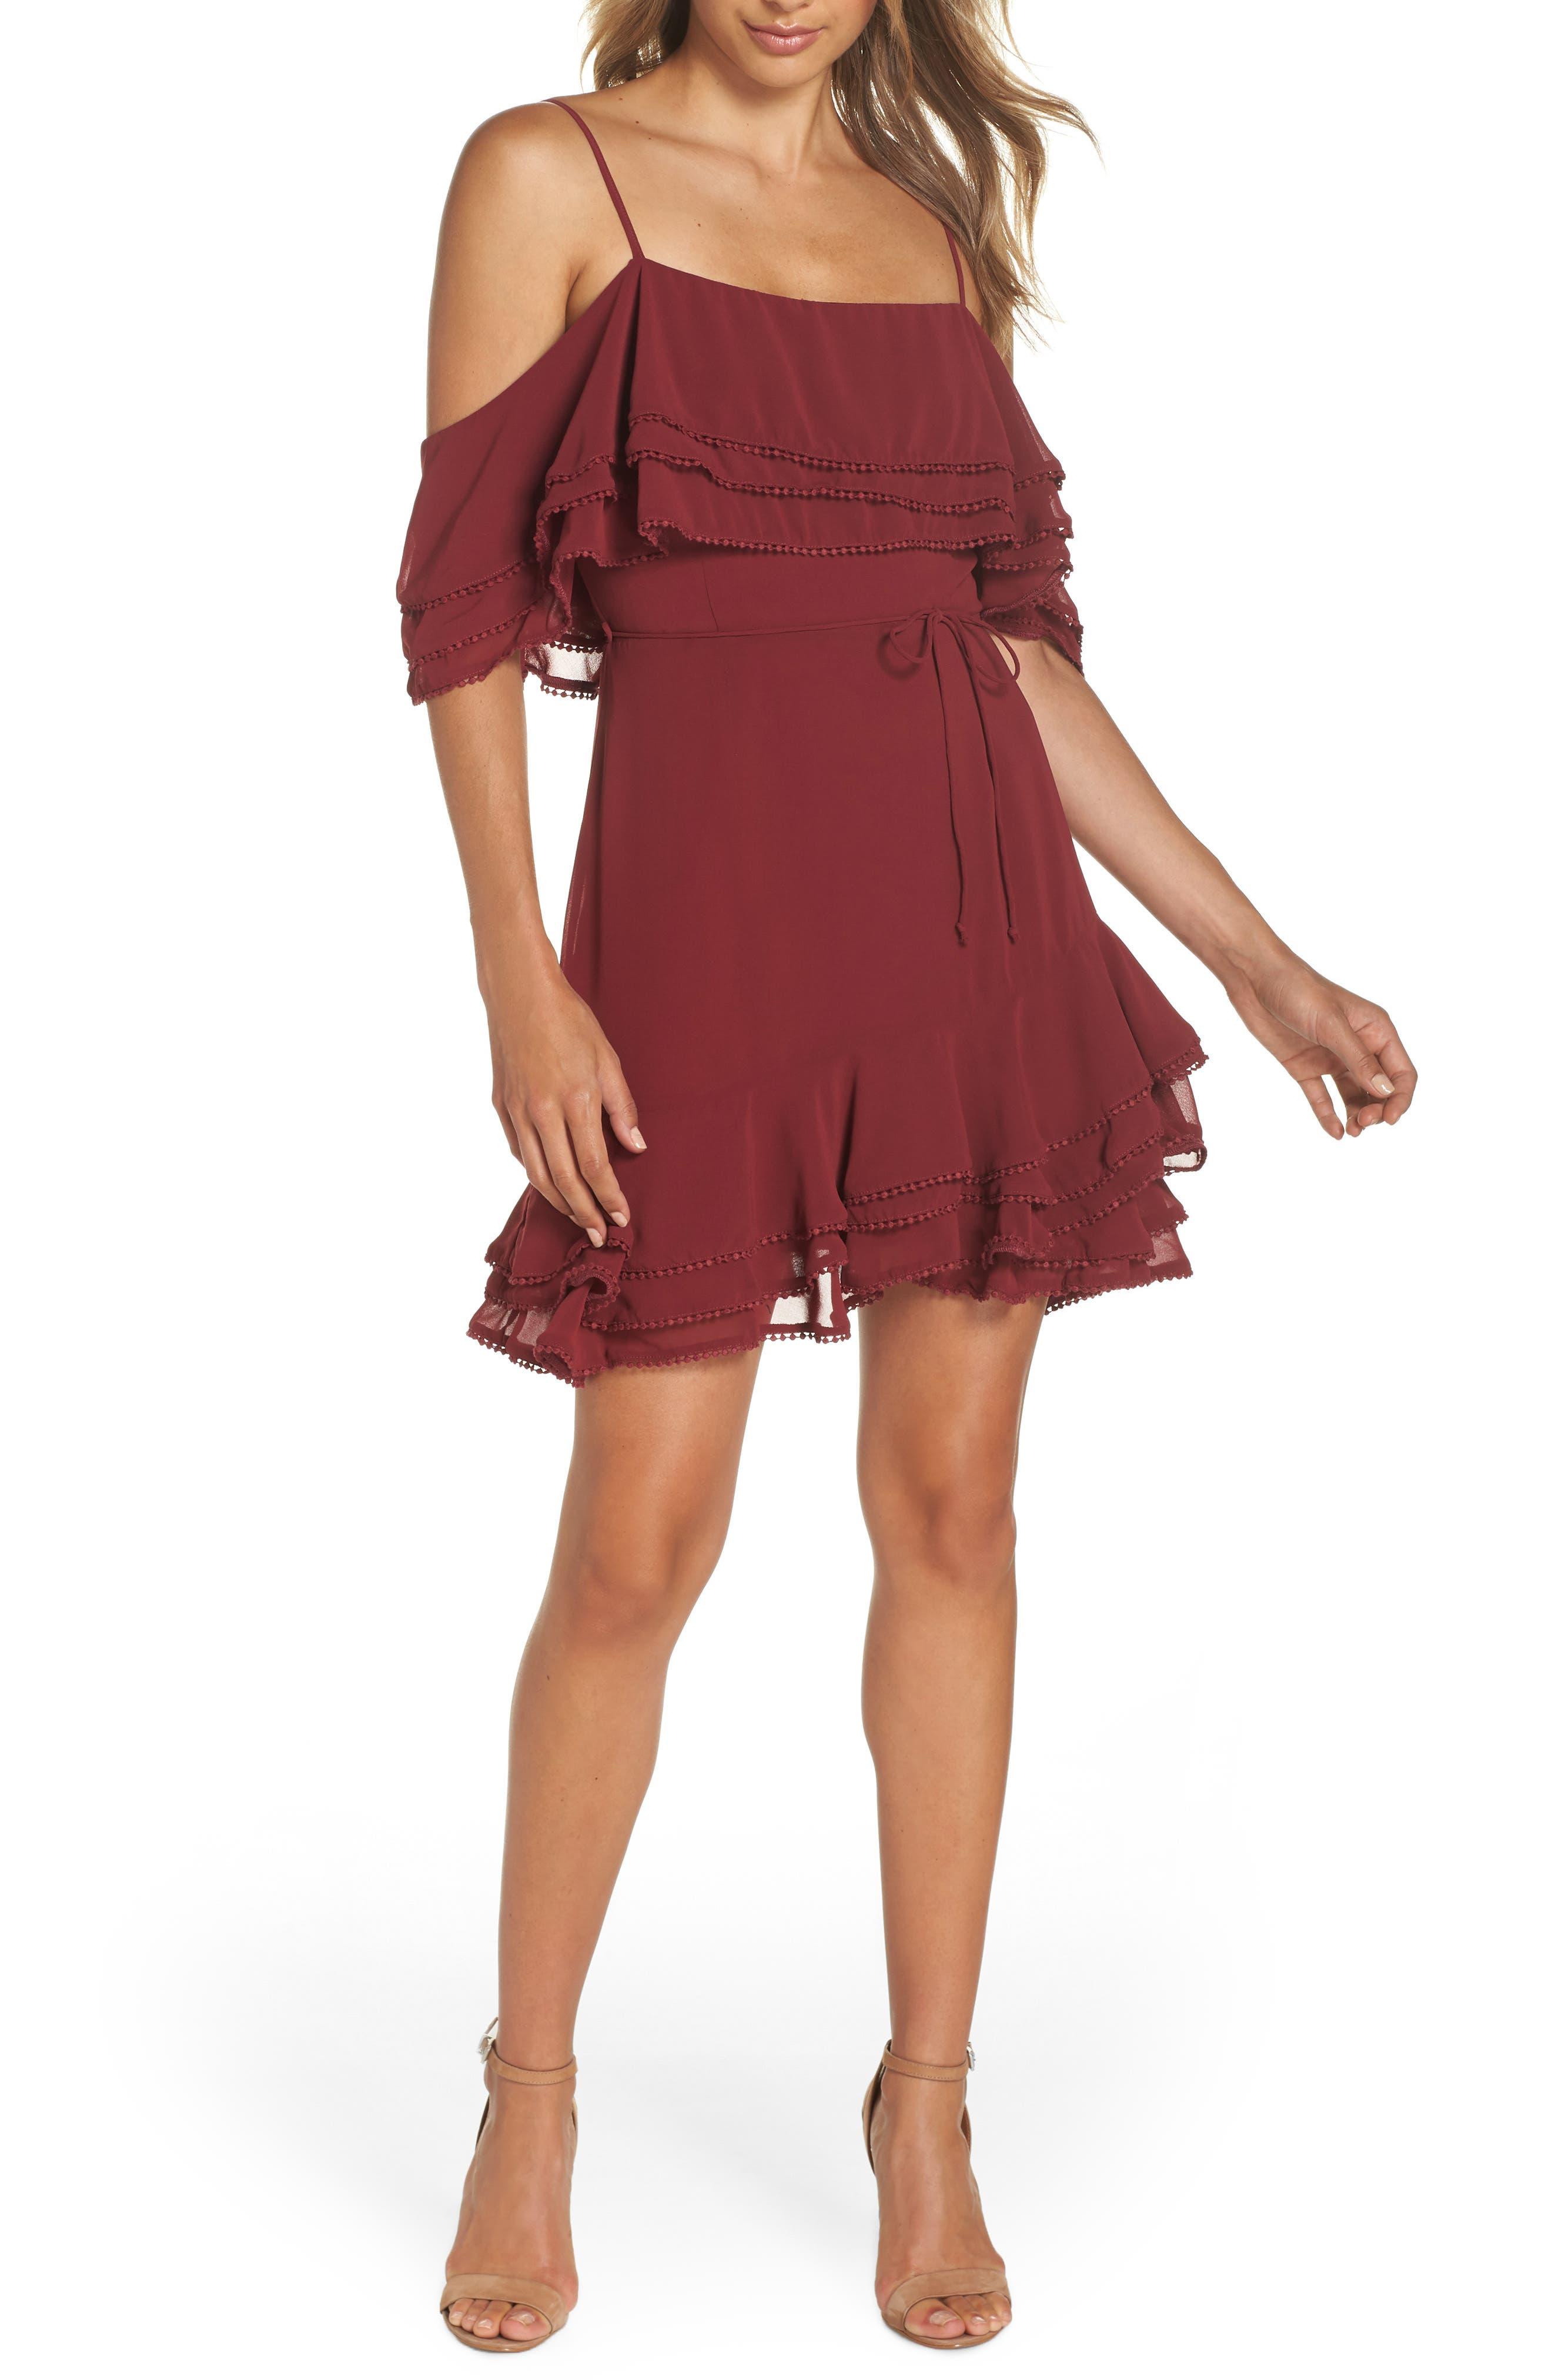 BB DAKOTA Up All Night Layered Cold Shoulder Dress, Main, color, 930